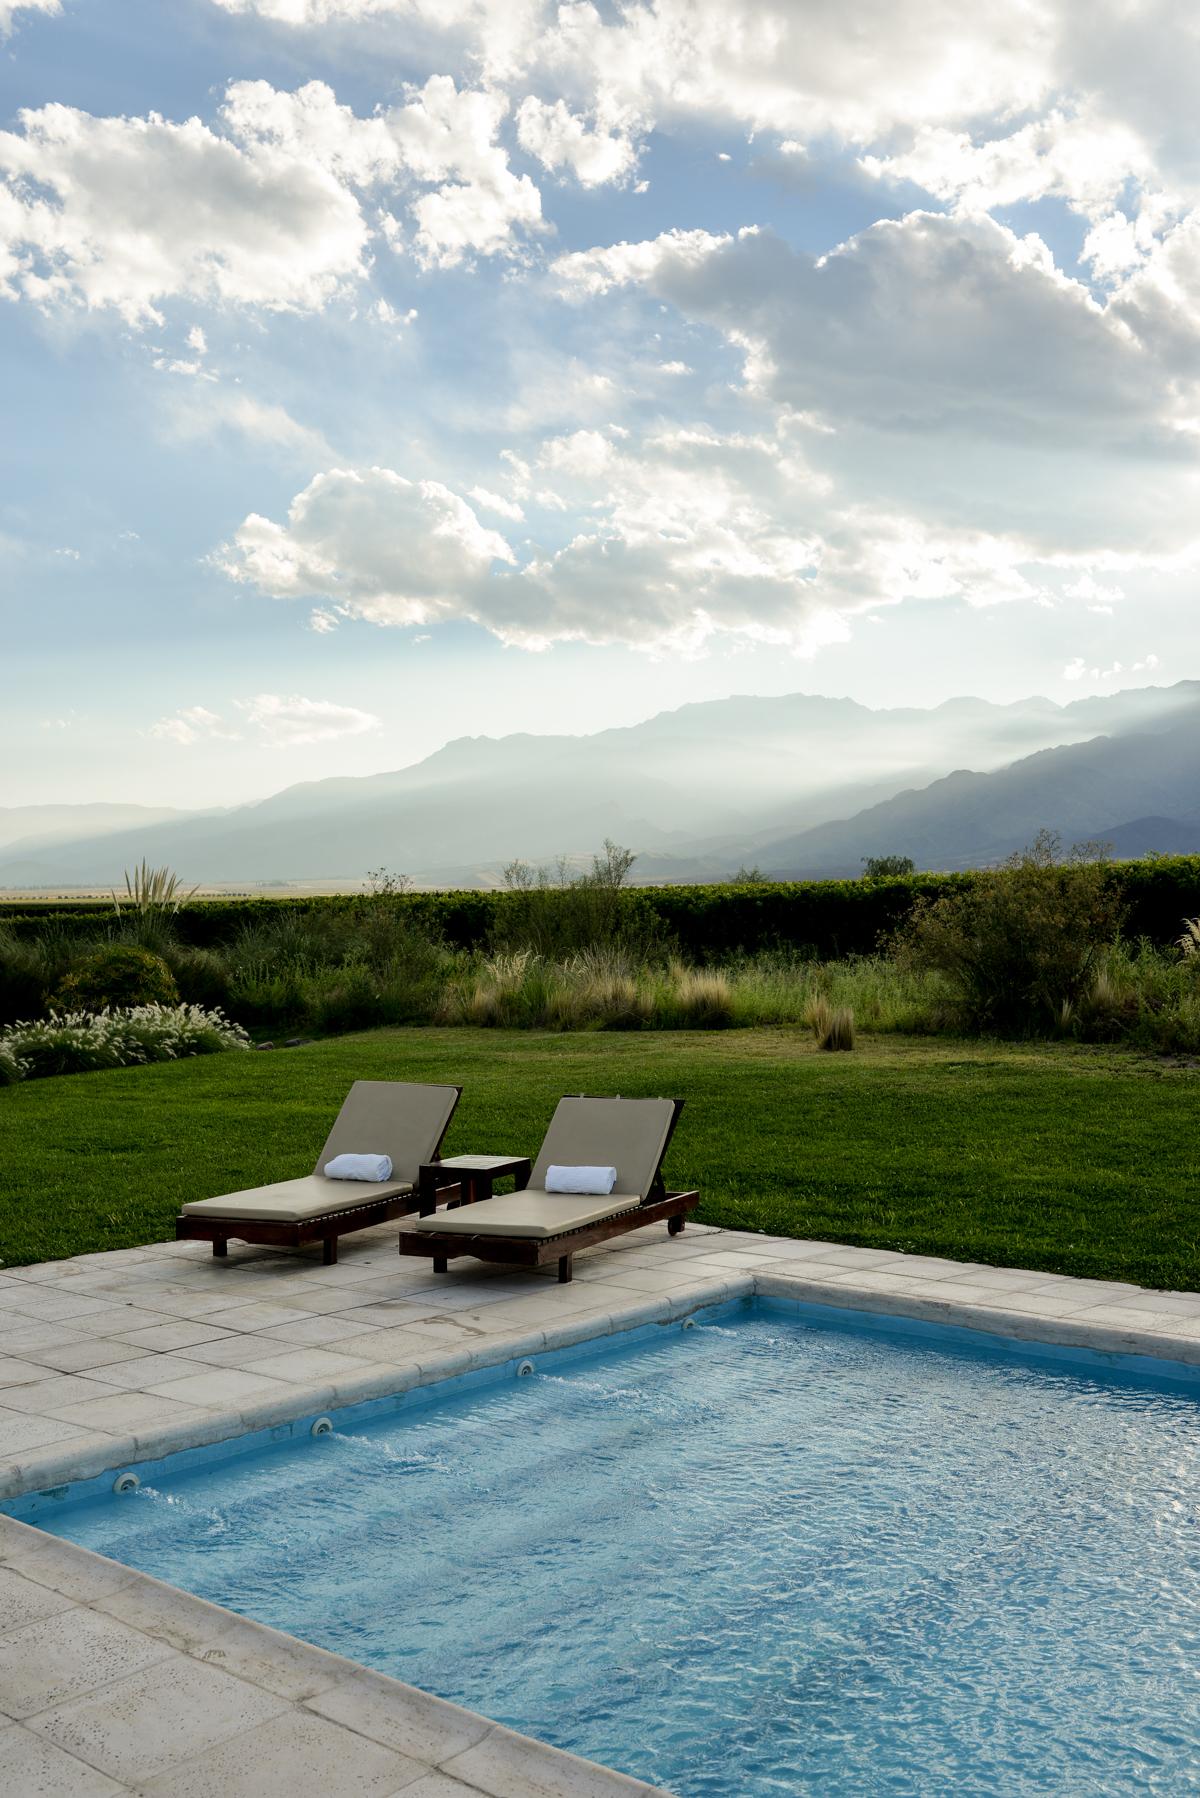 Stacie-Flinner-Best-Mendoza-Winery-17